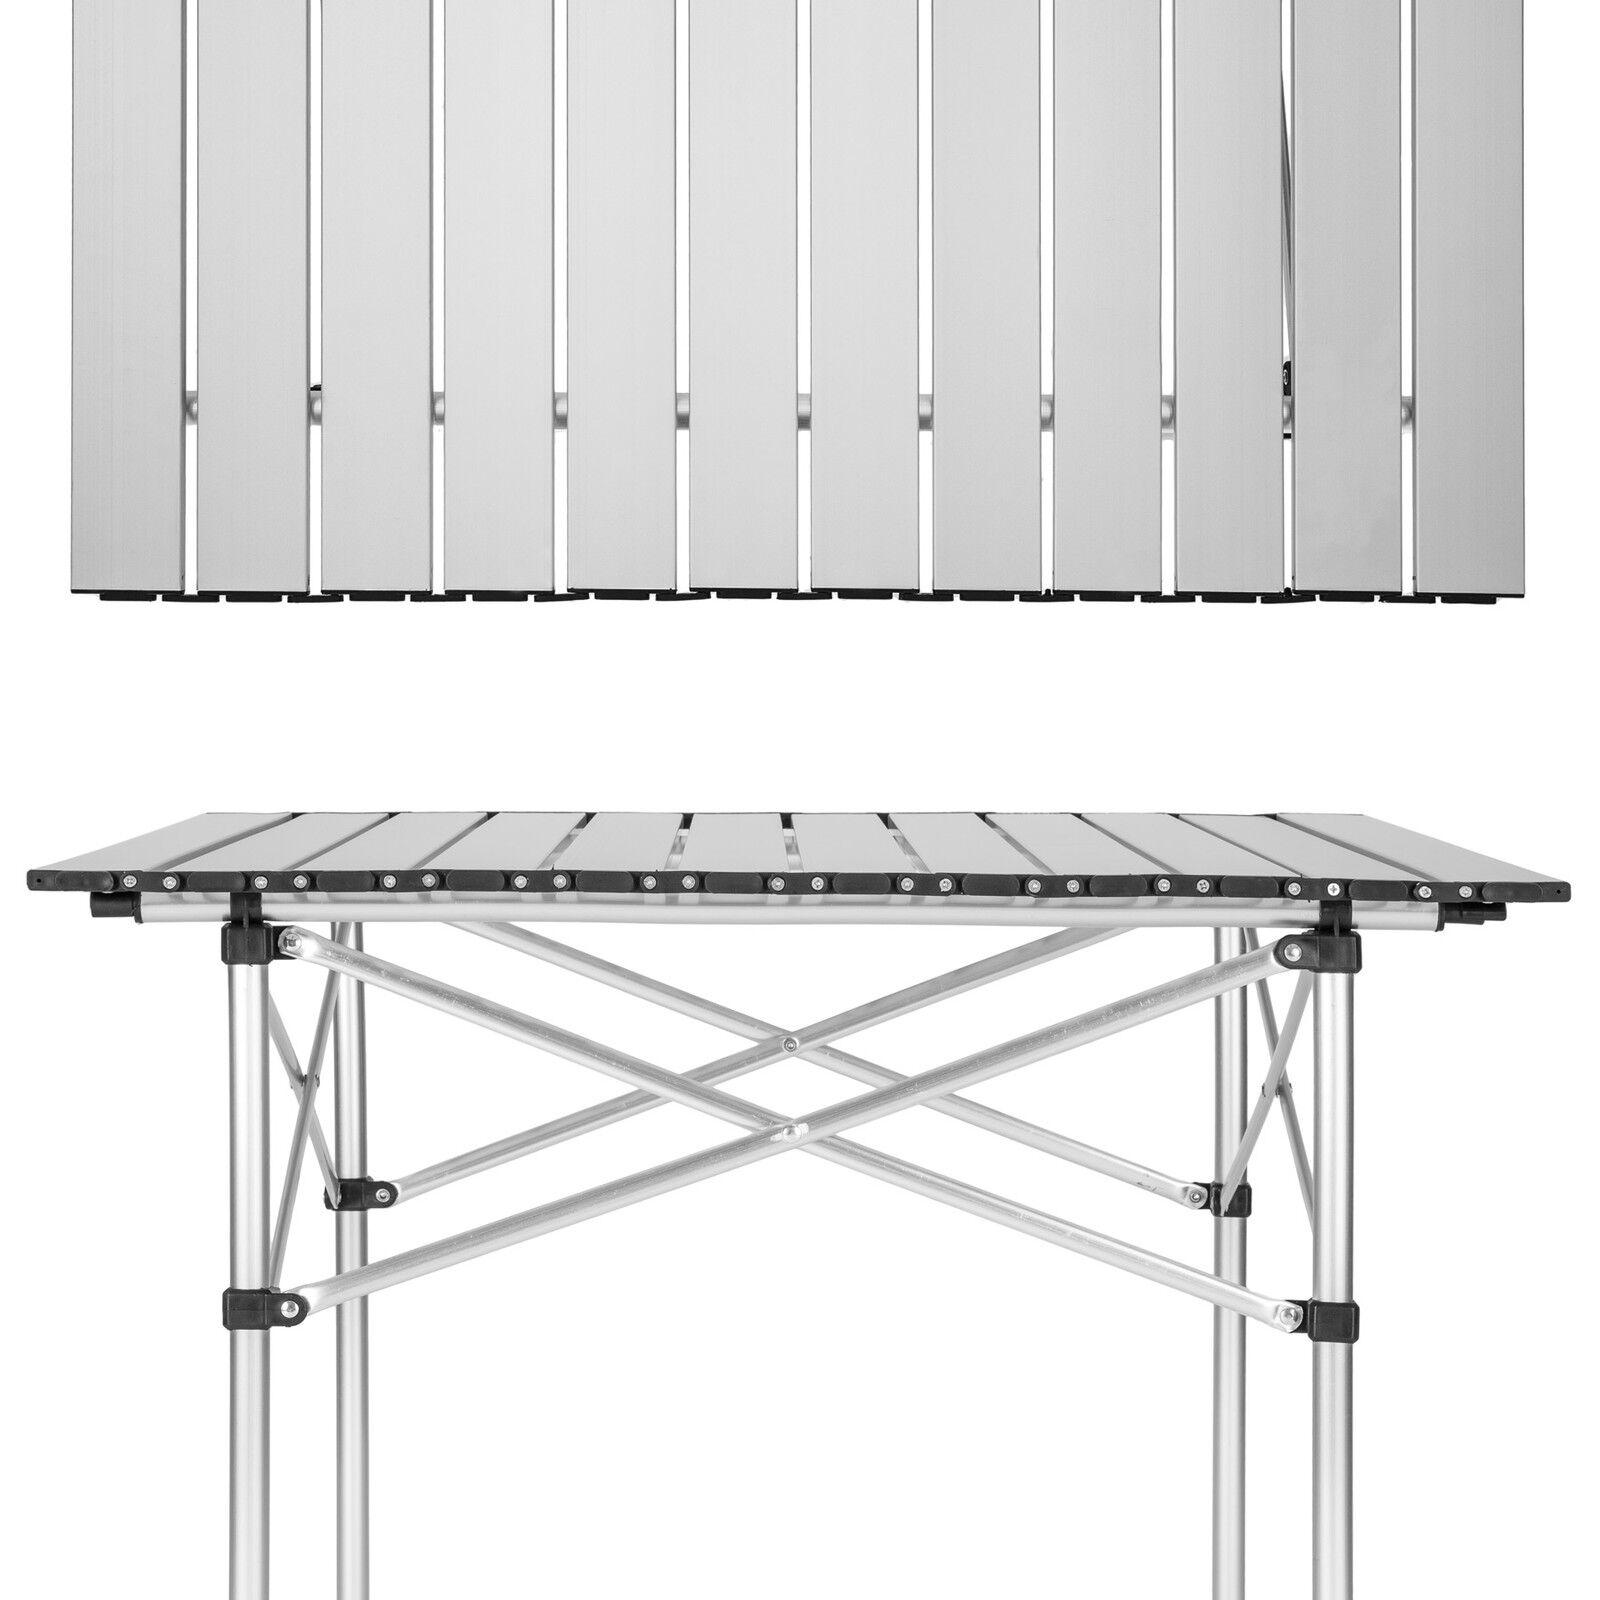 Beautiful table de jardin pliante monoprix contemporary - Table de jardin pliable ...